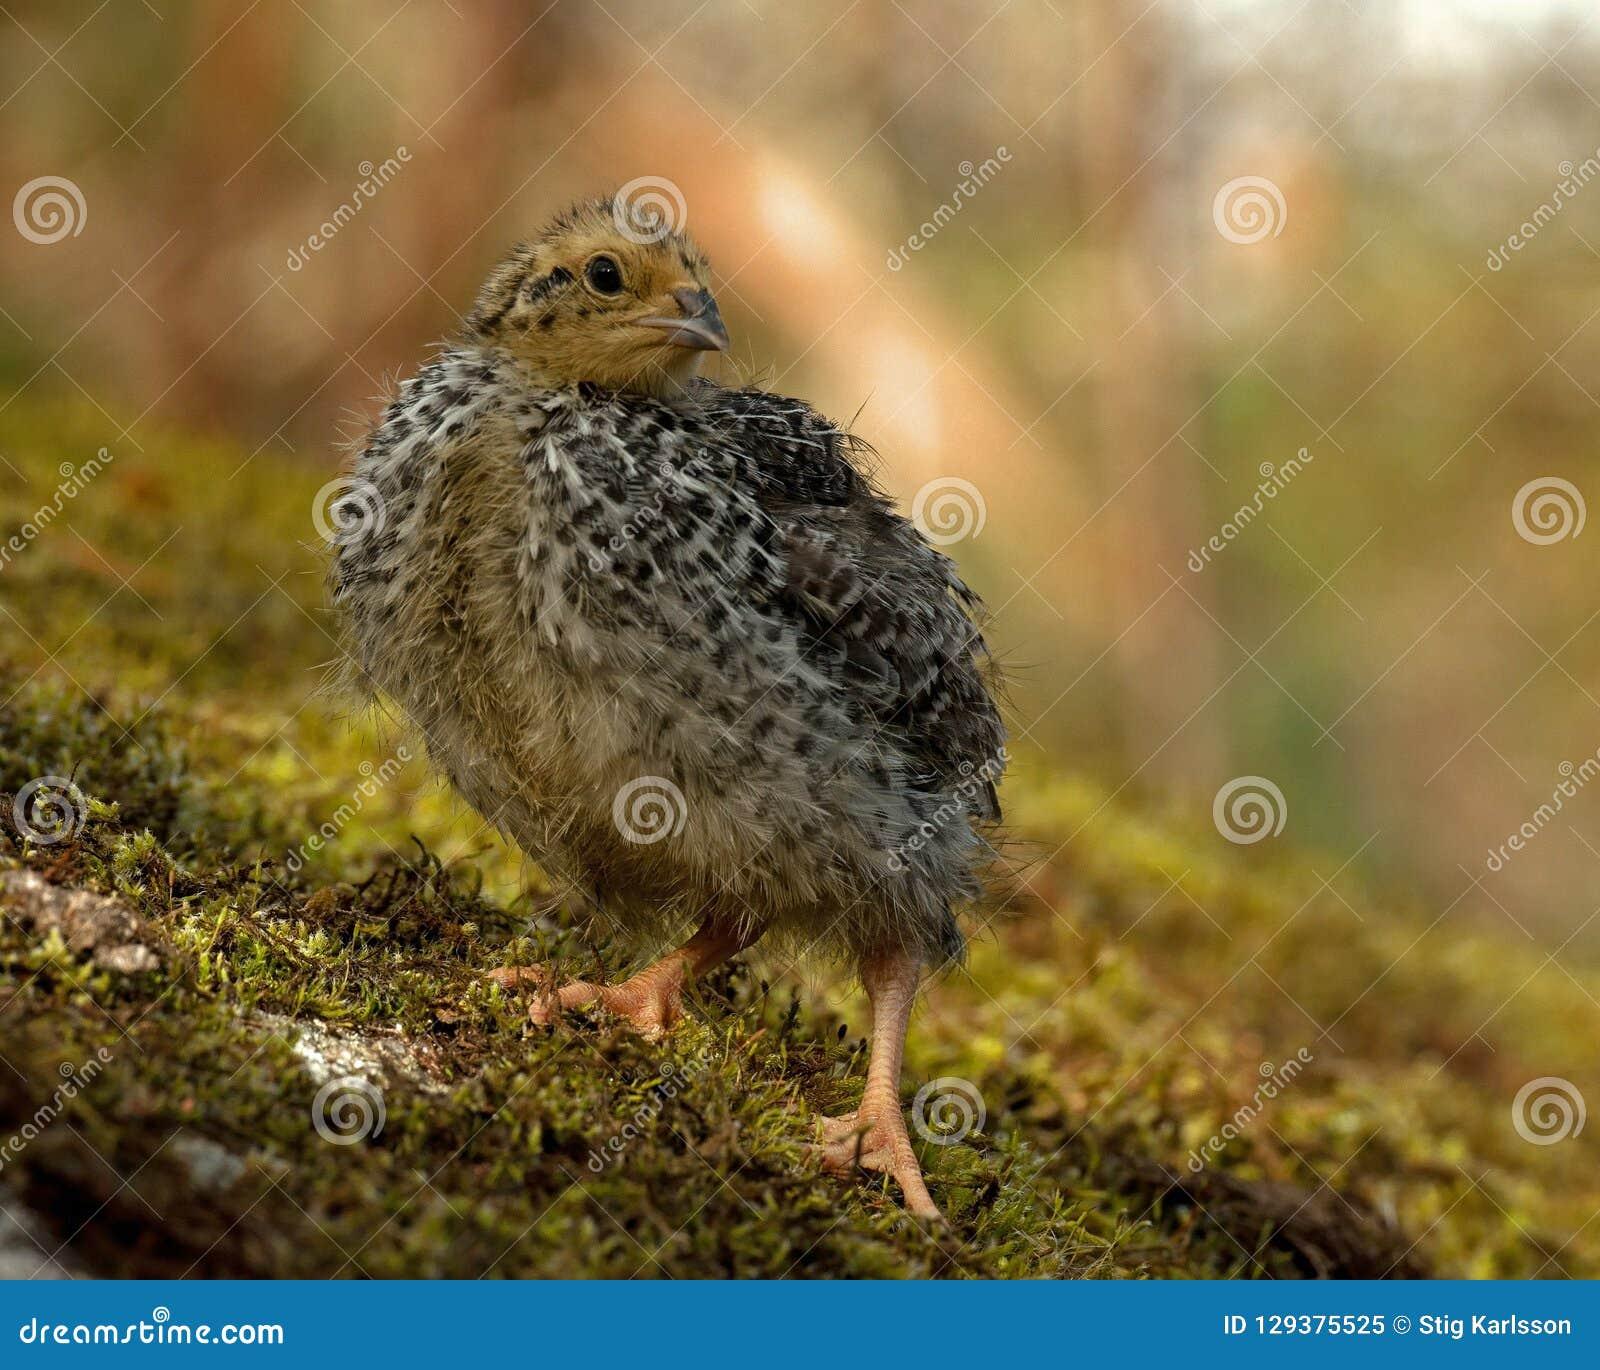 Twelve days old quail, Coturnix japonica..... photographed in nature.